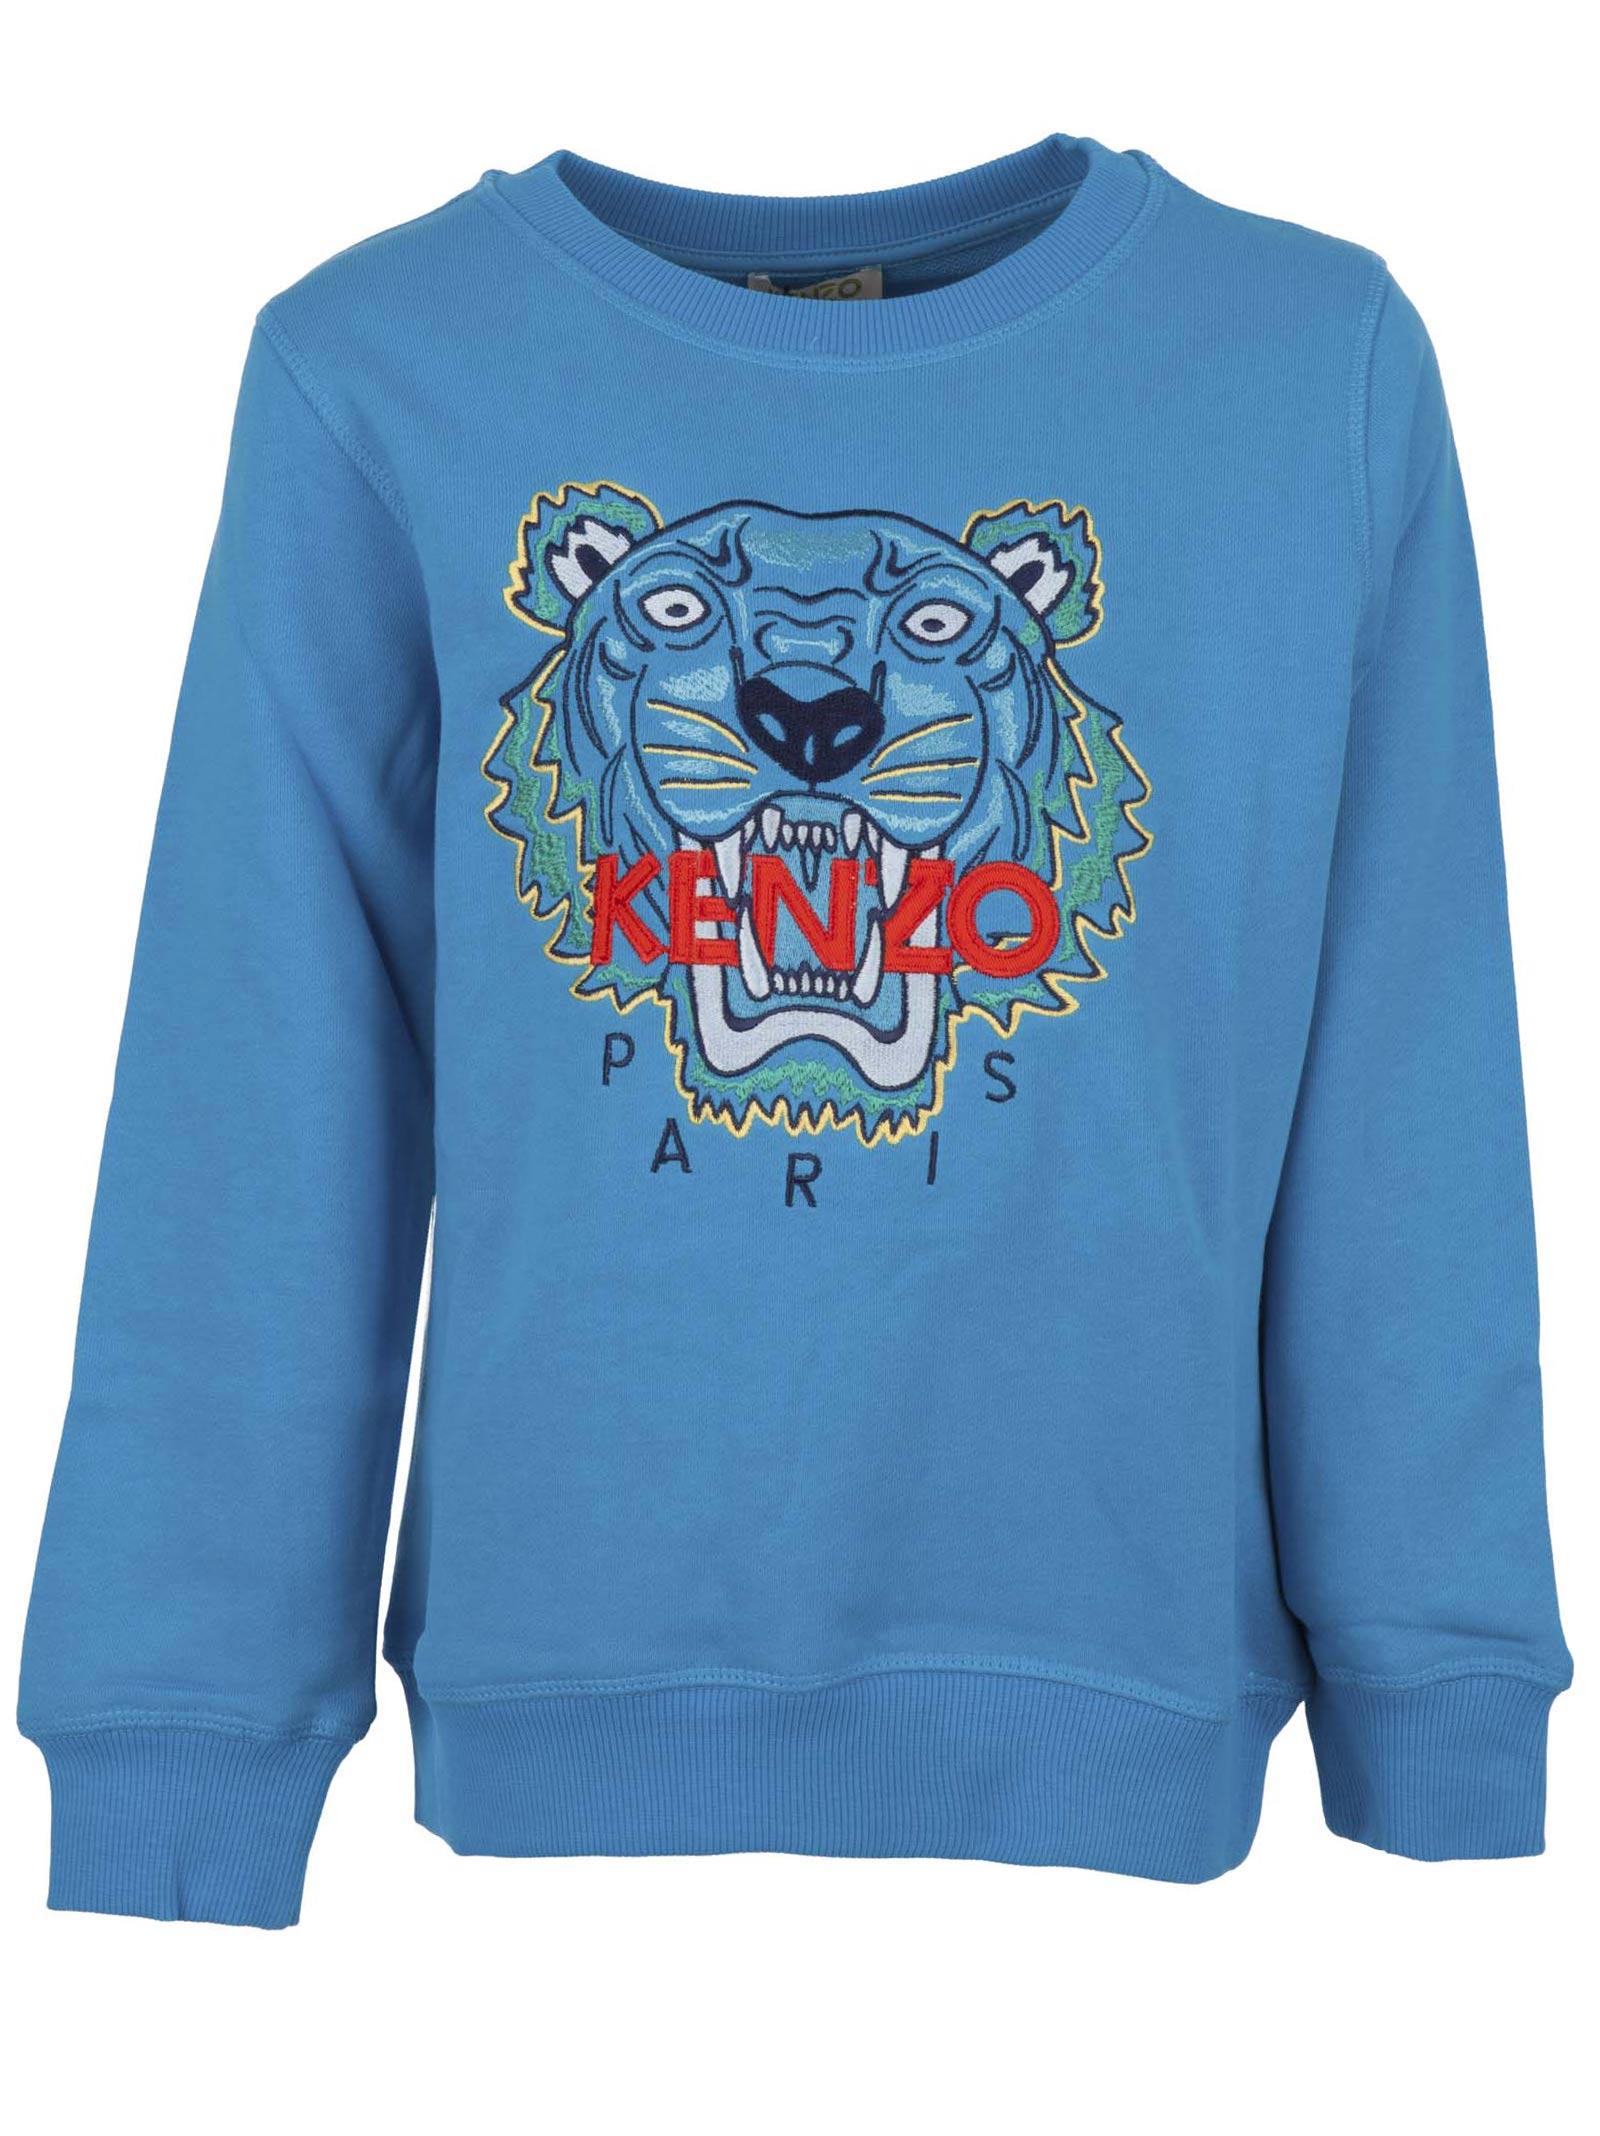 d84c14f7 Kenzo Junior. Tiger long-sleeved light blue cotton sweatshirt ...